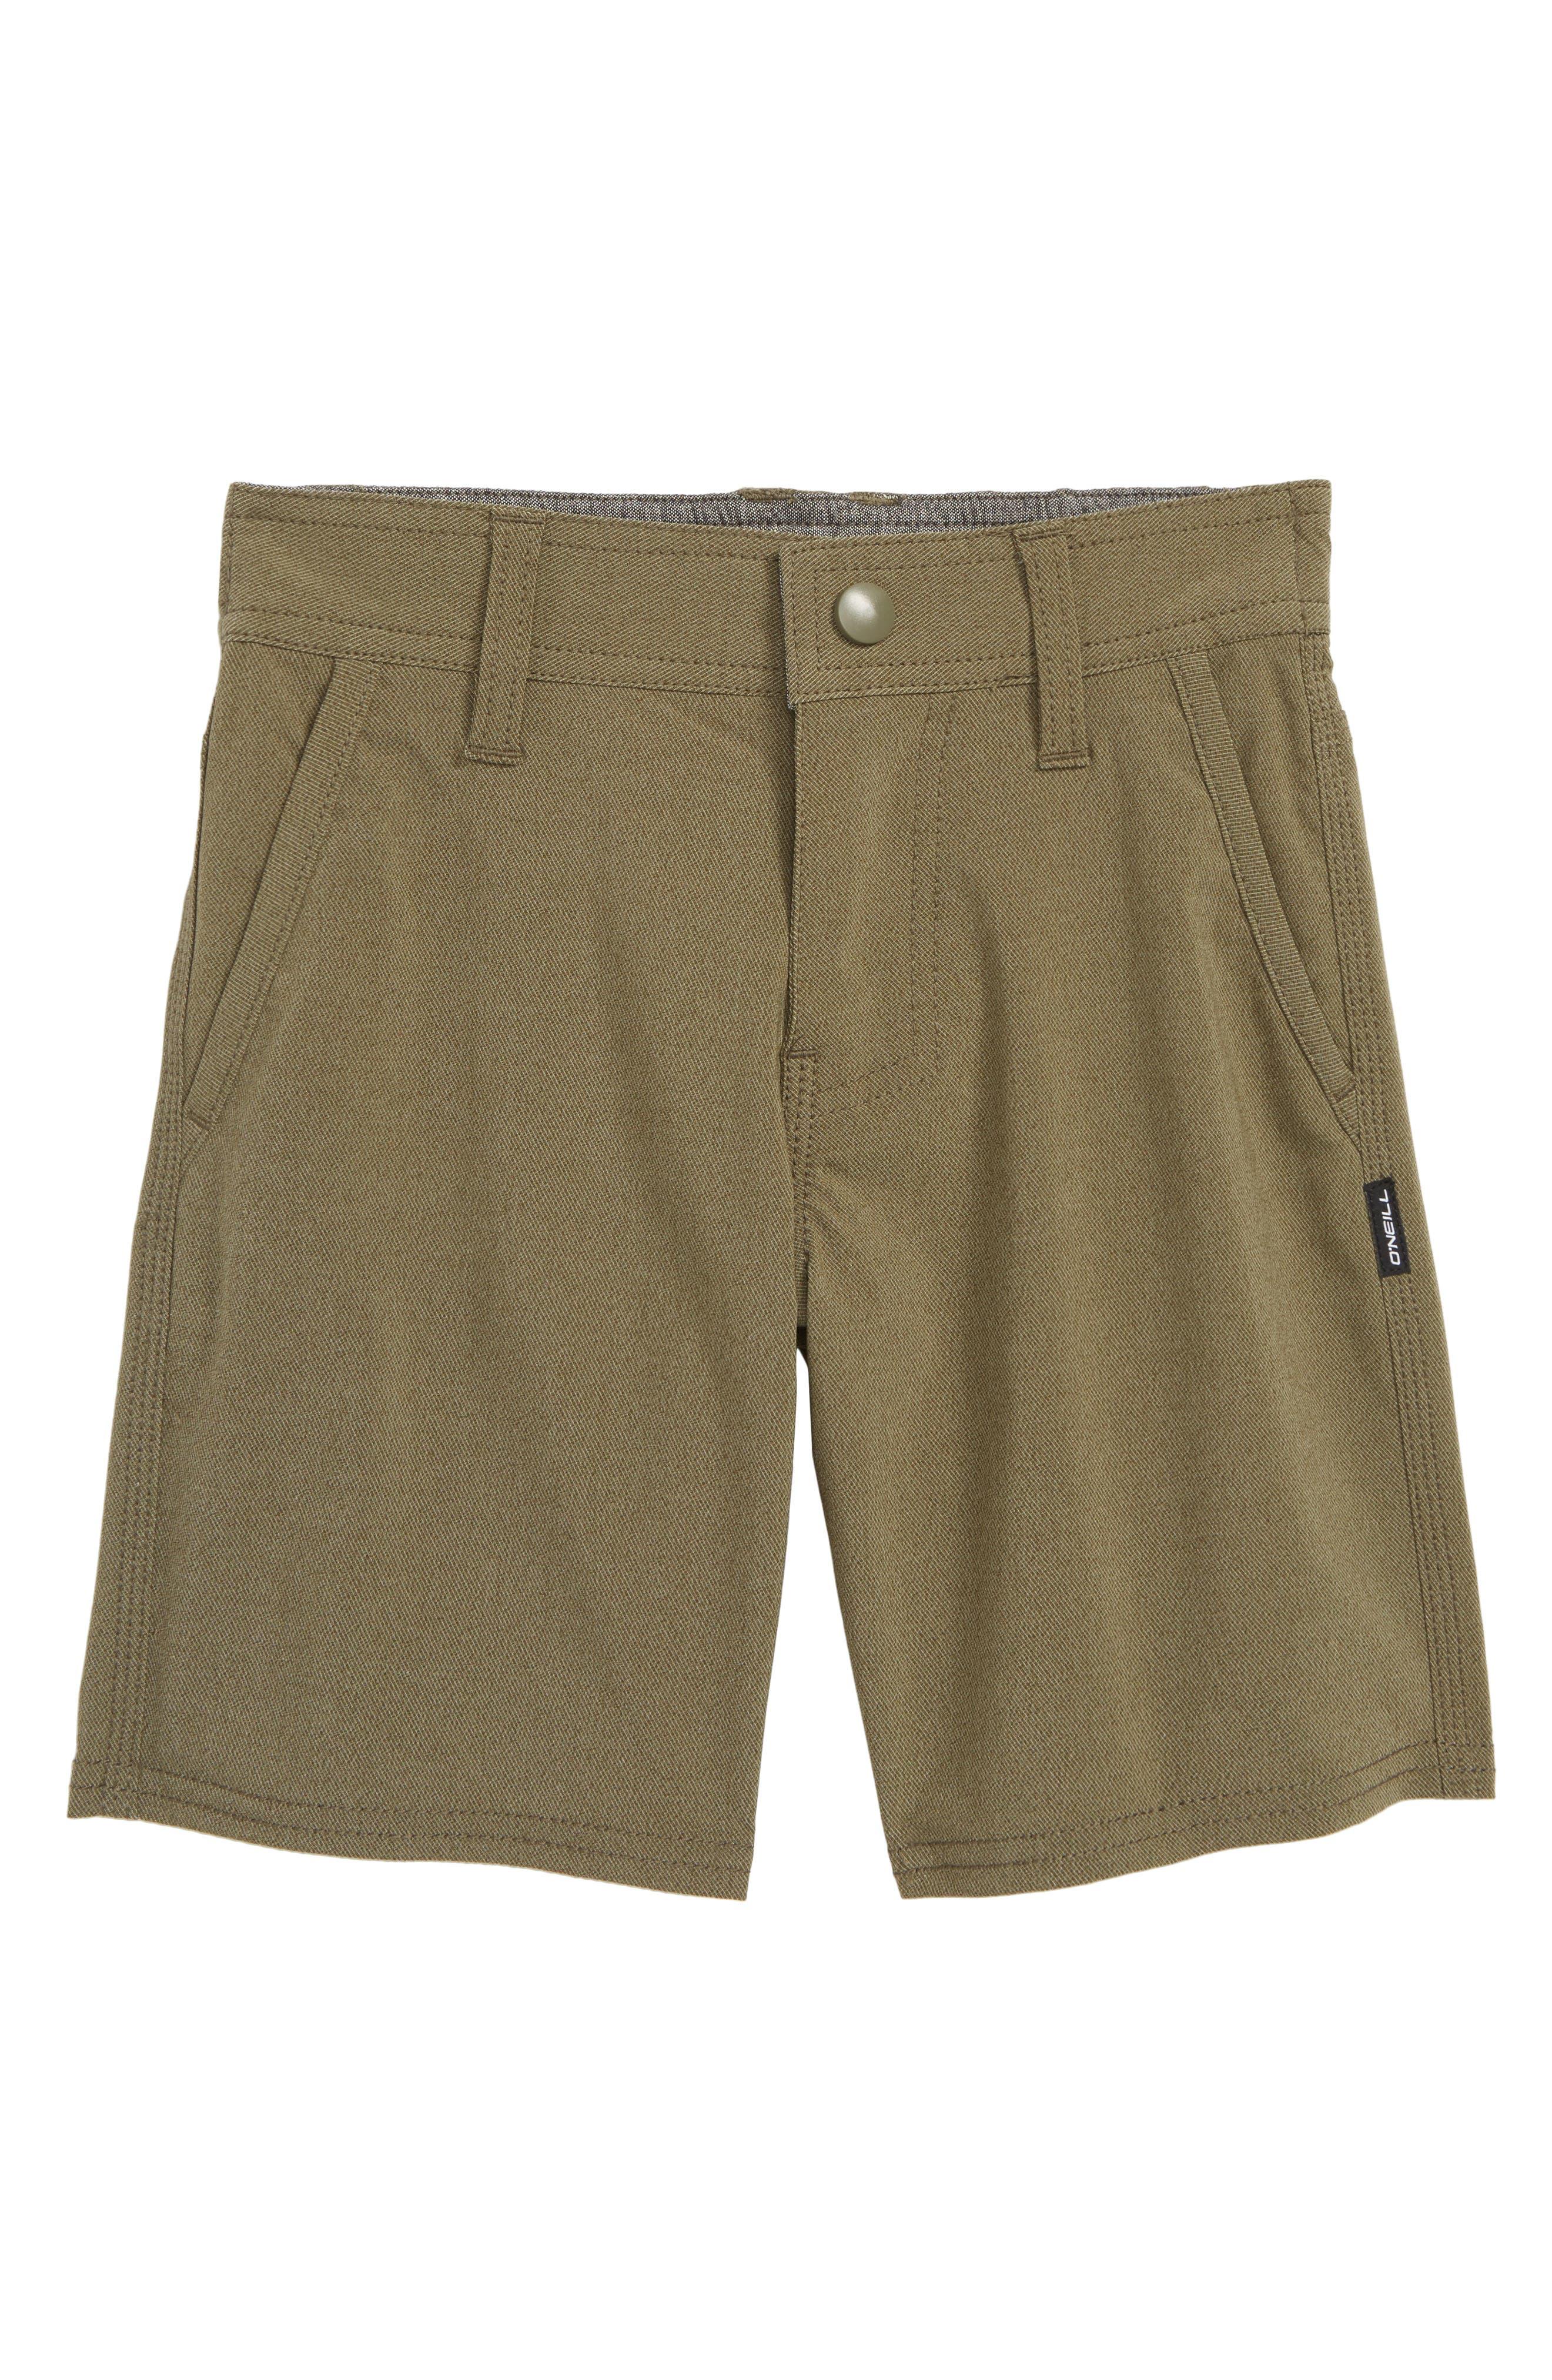 Stockton Hybrid Shorts,                             Main thumbnail 1, color,                             MILITARY GREEN